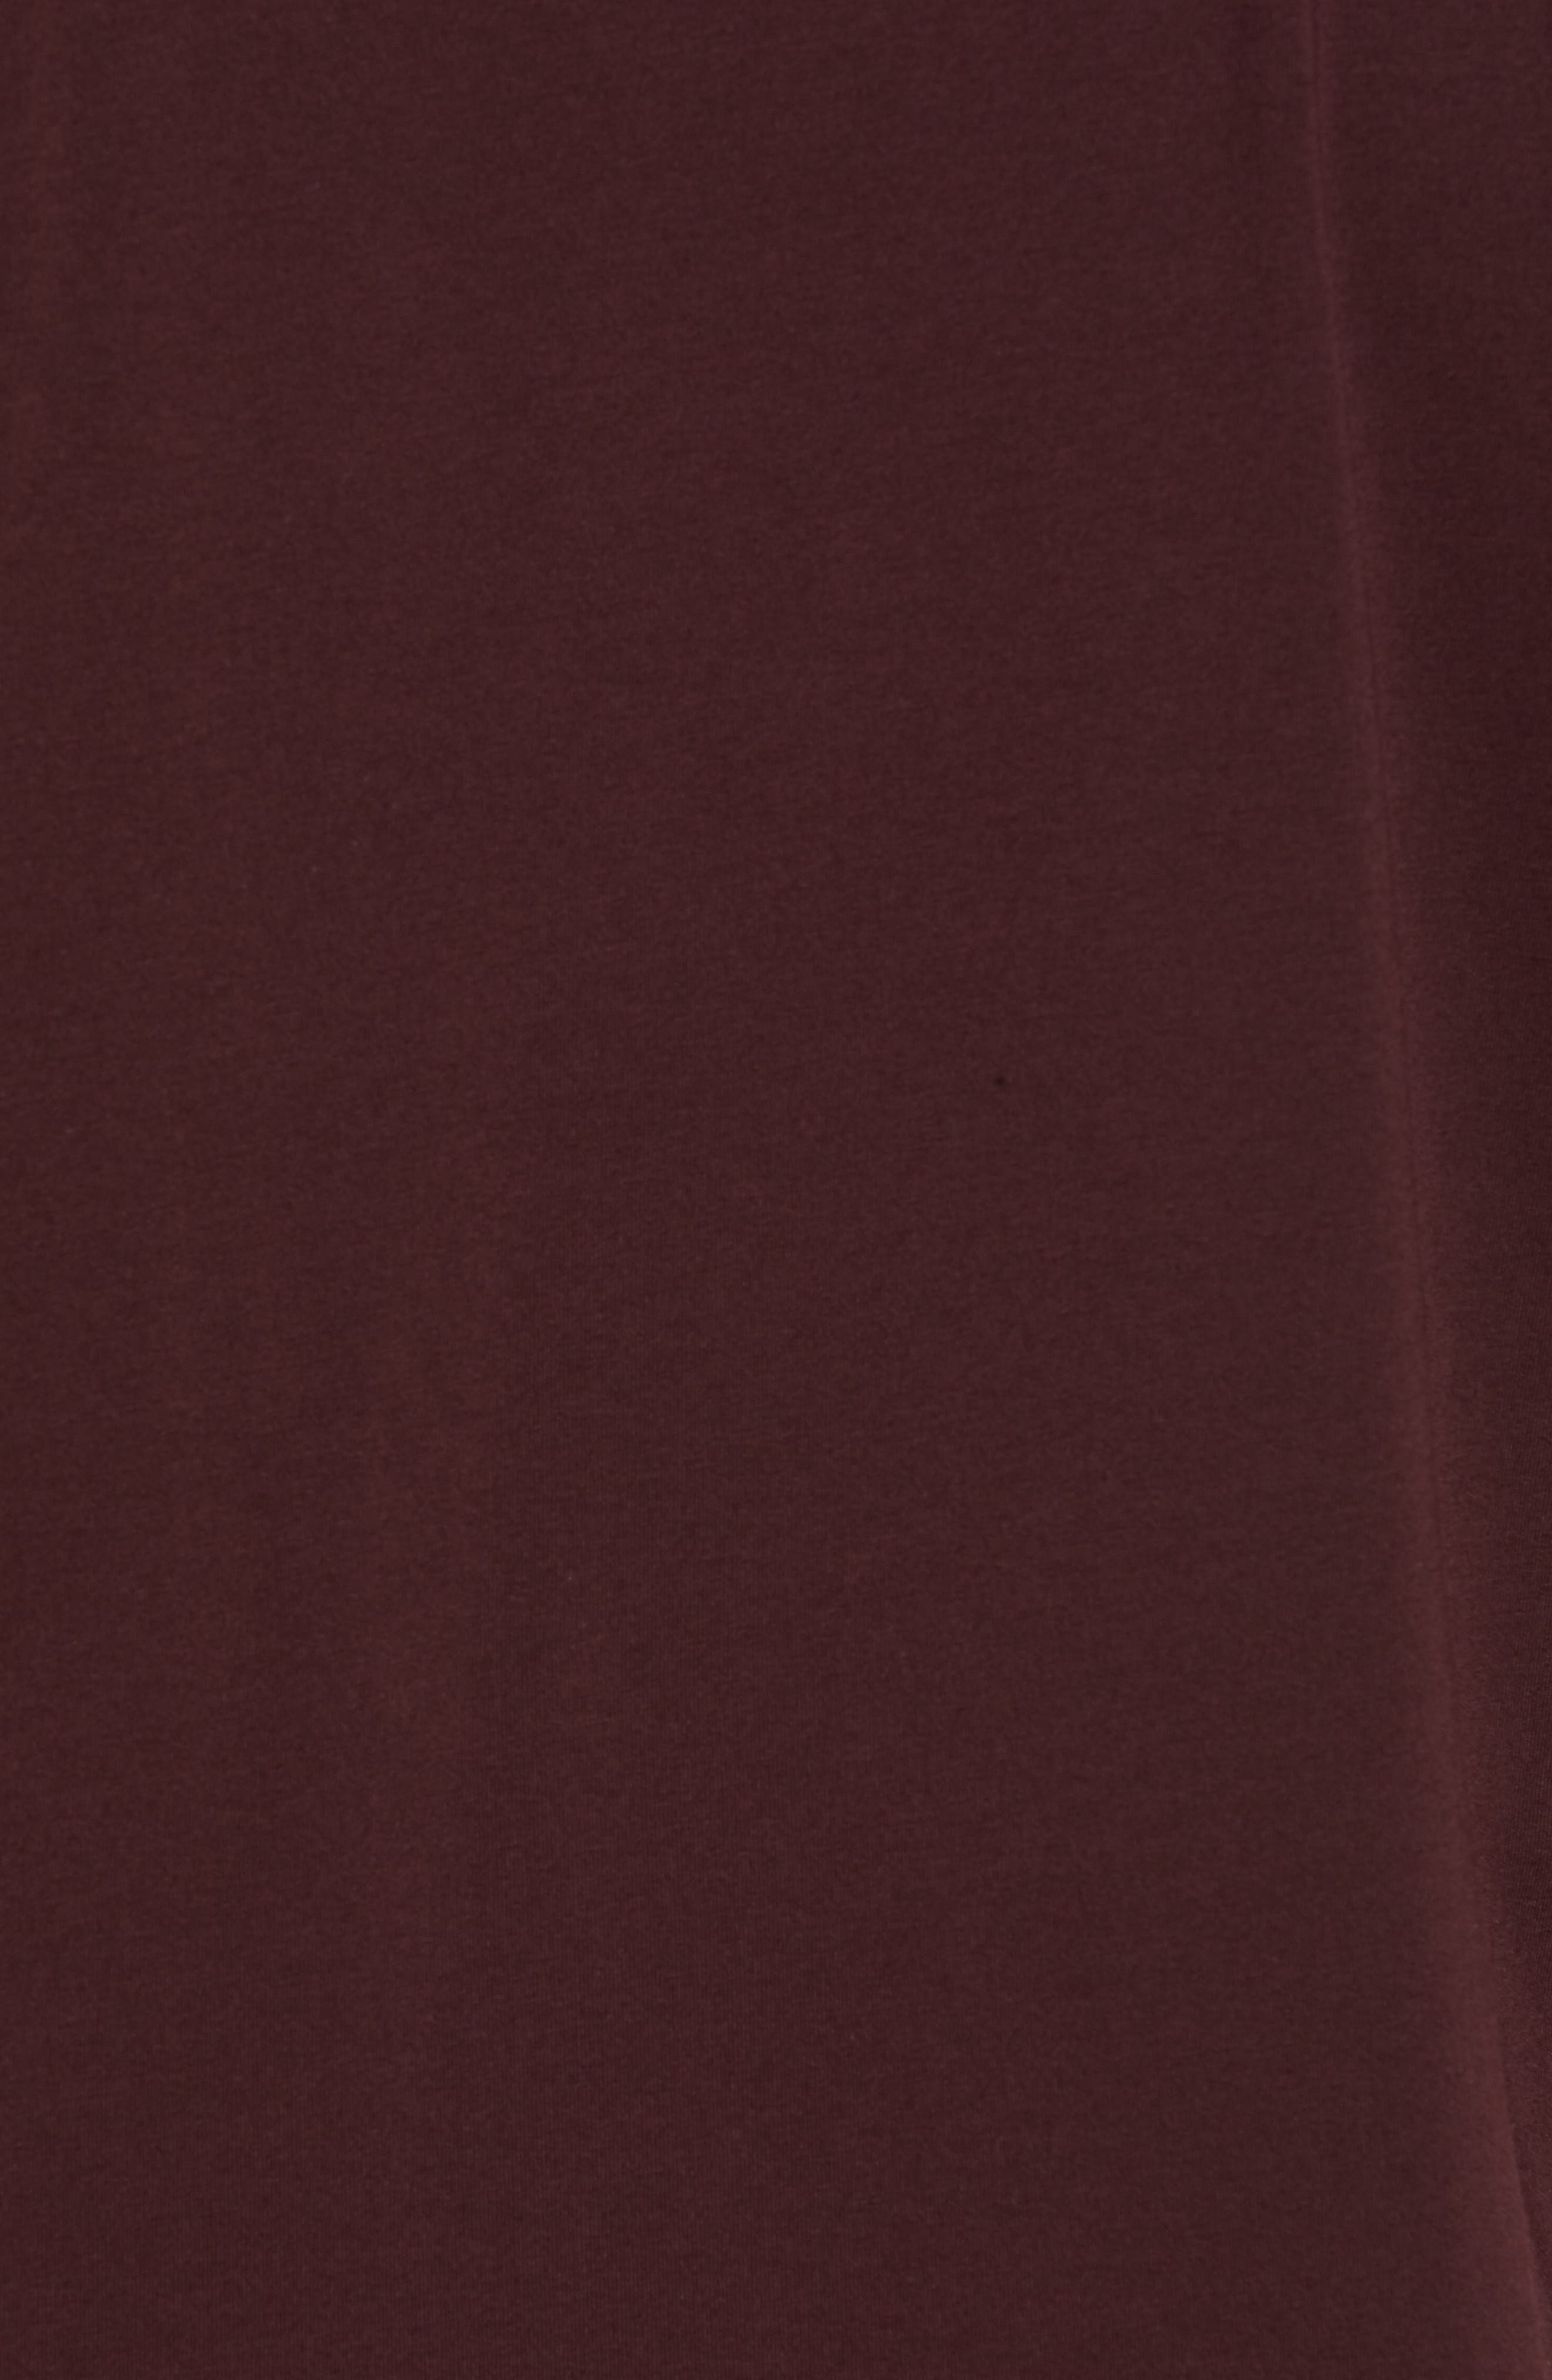 Stretch Cotton & Modal Short Sleeve Henley,                             Alternate thumbnail 5, color,                             WINE